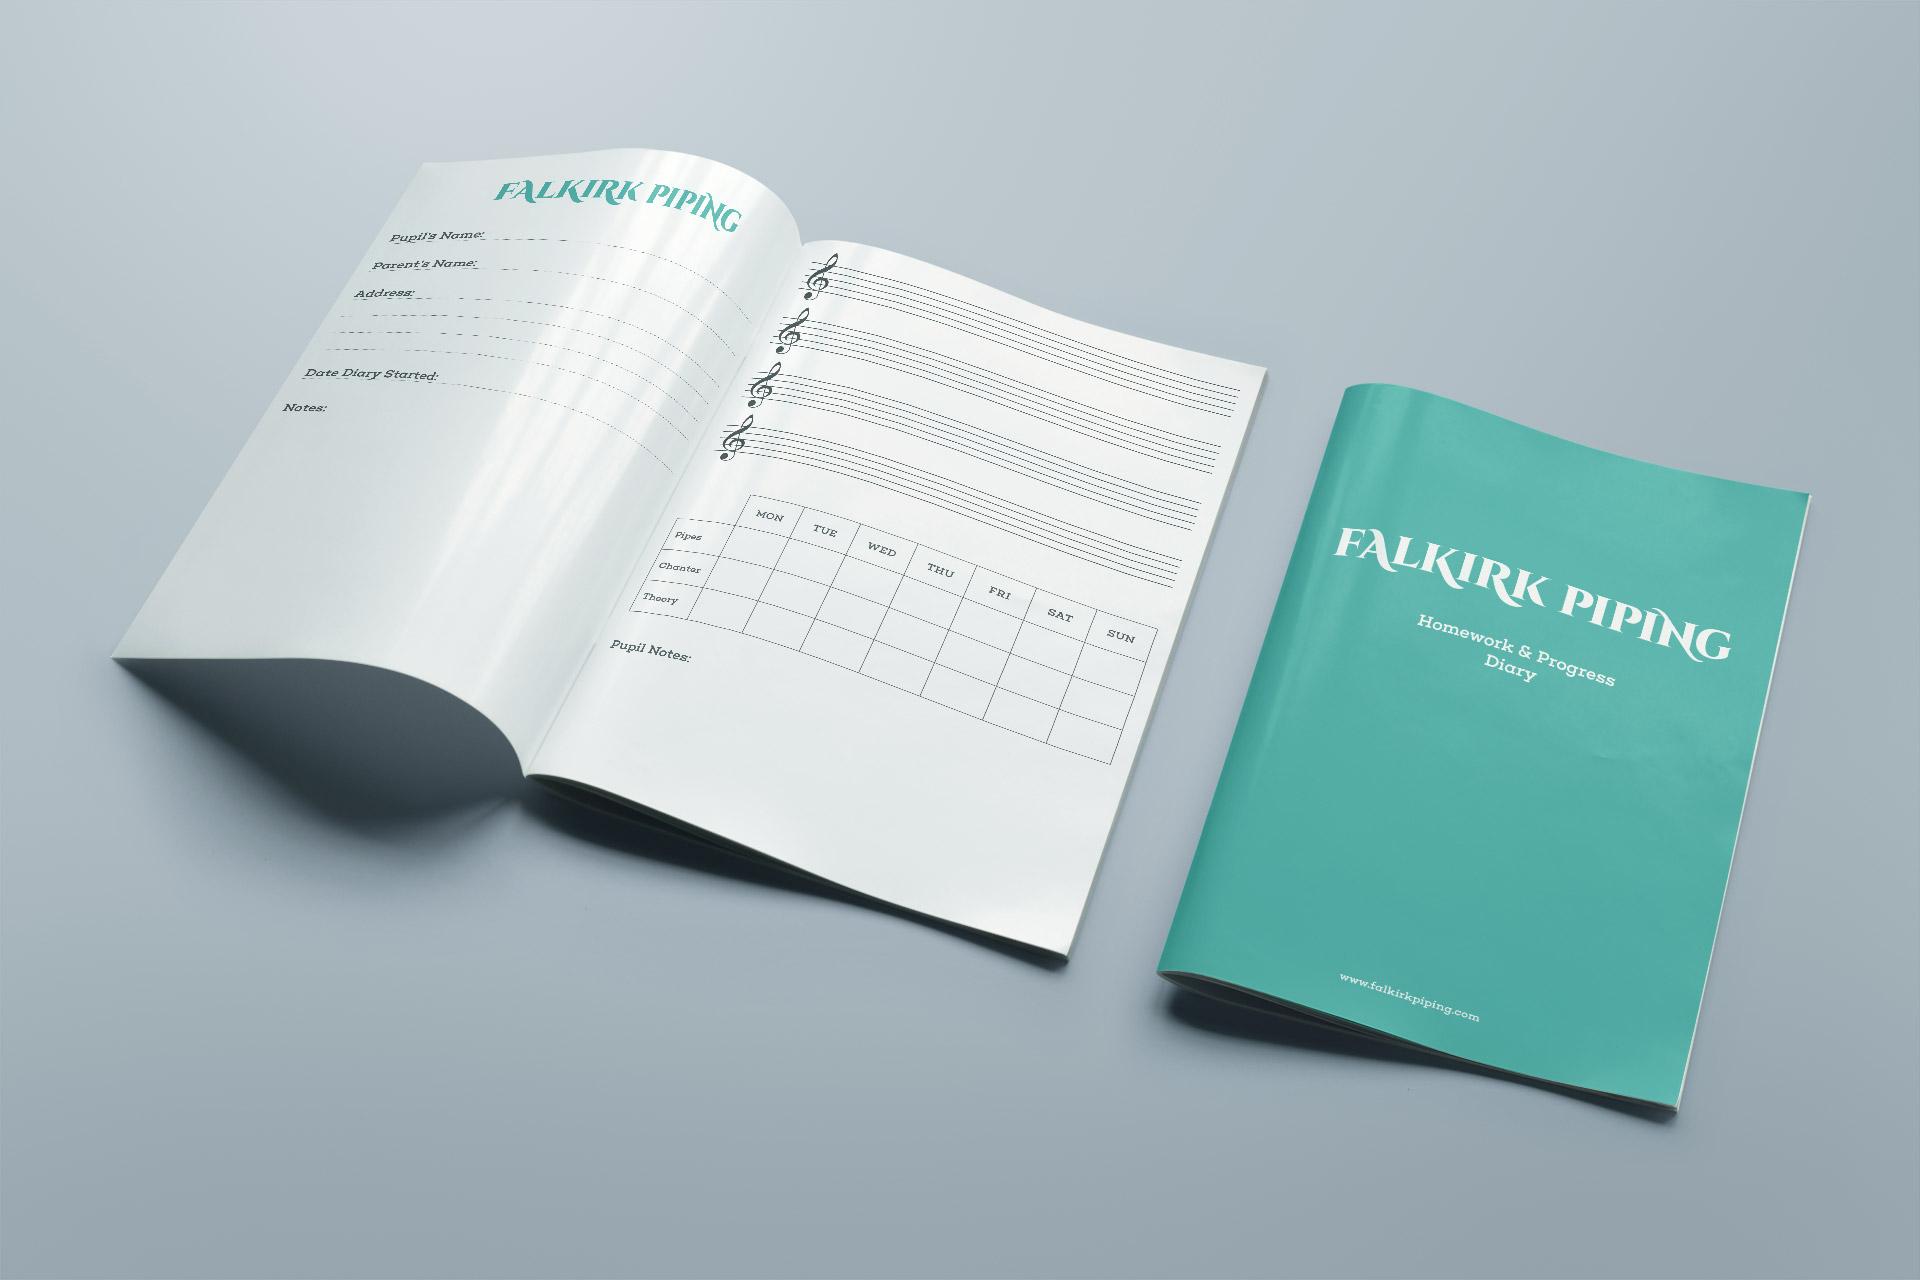 Falkirk Piping Glenbervie Duo Homework Booklet